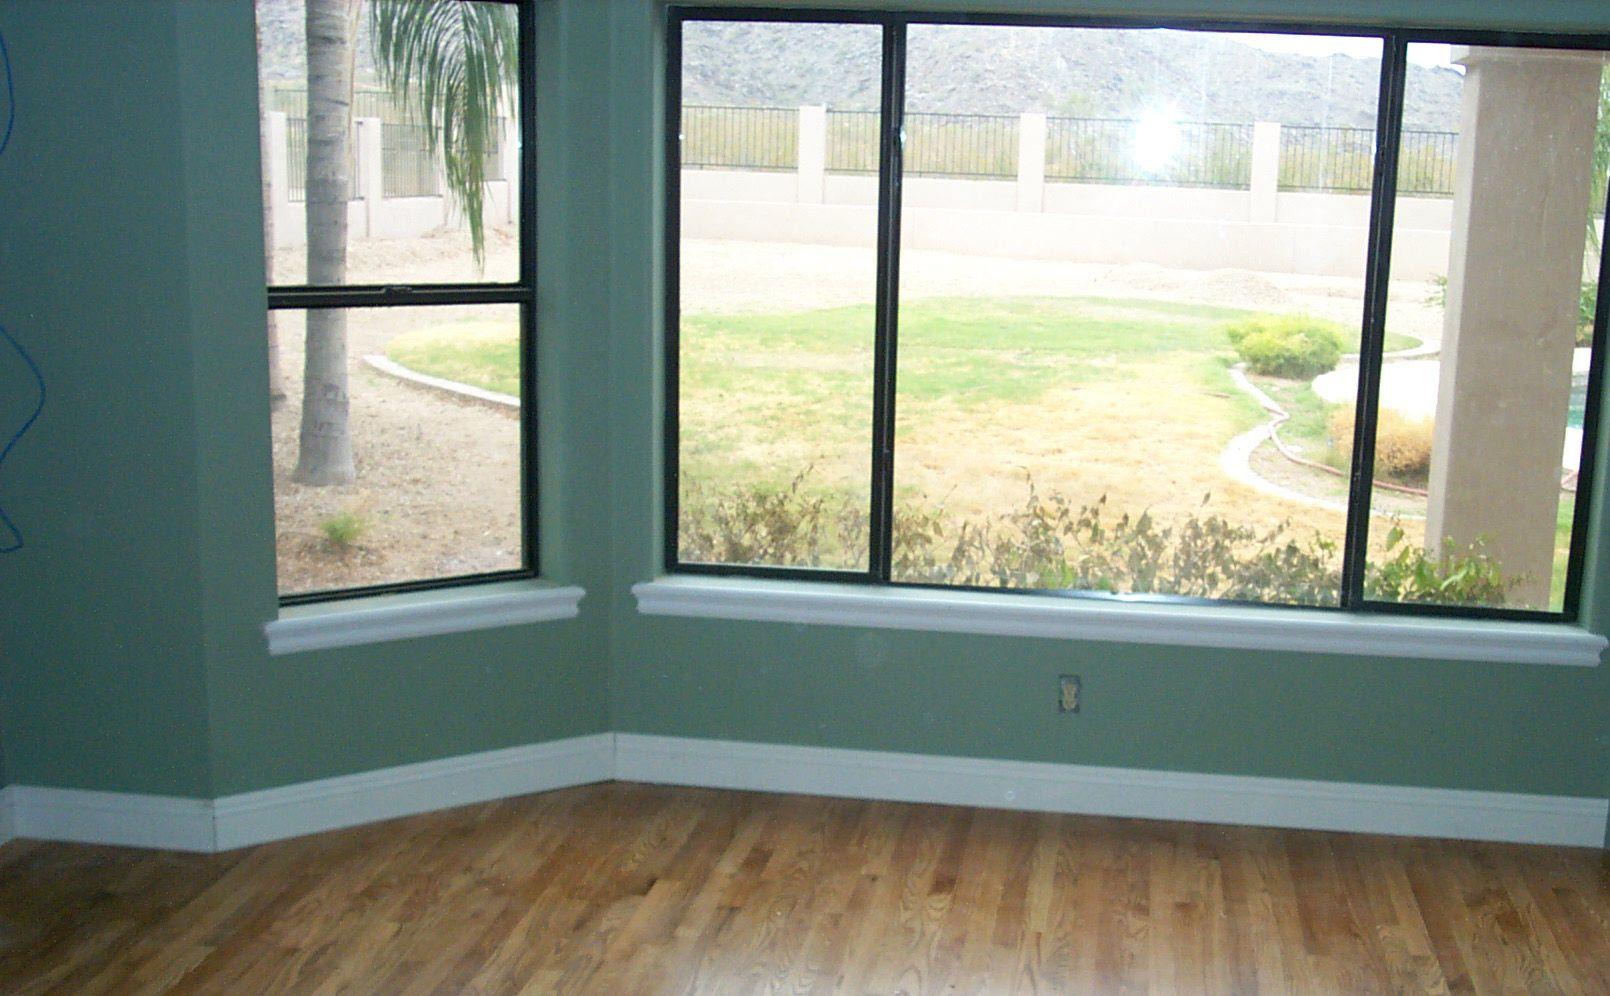 interior window sill | window-sill-ideas-window-trim-will-give ...